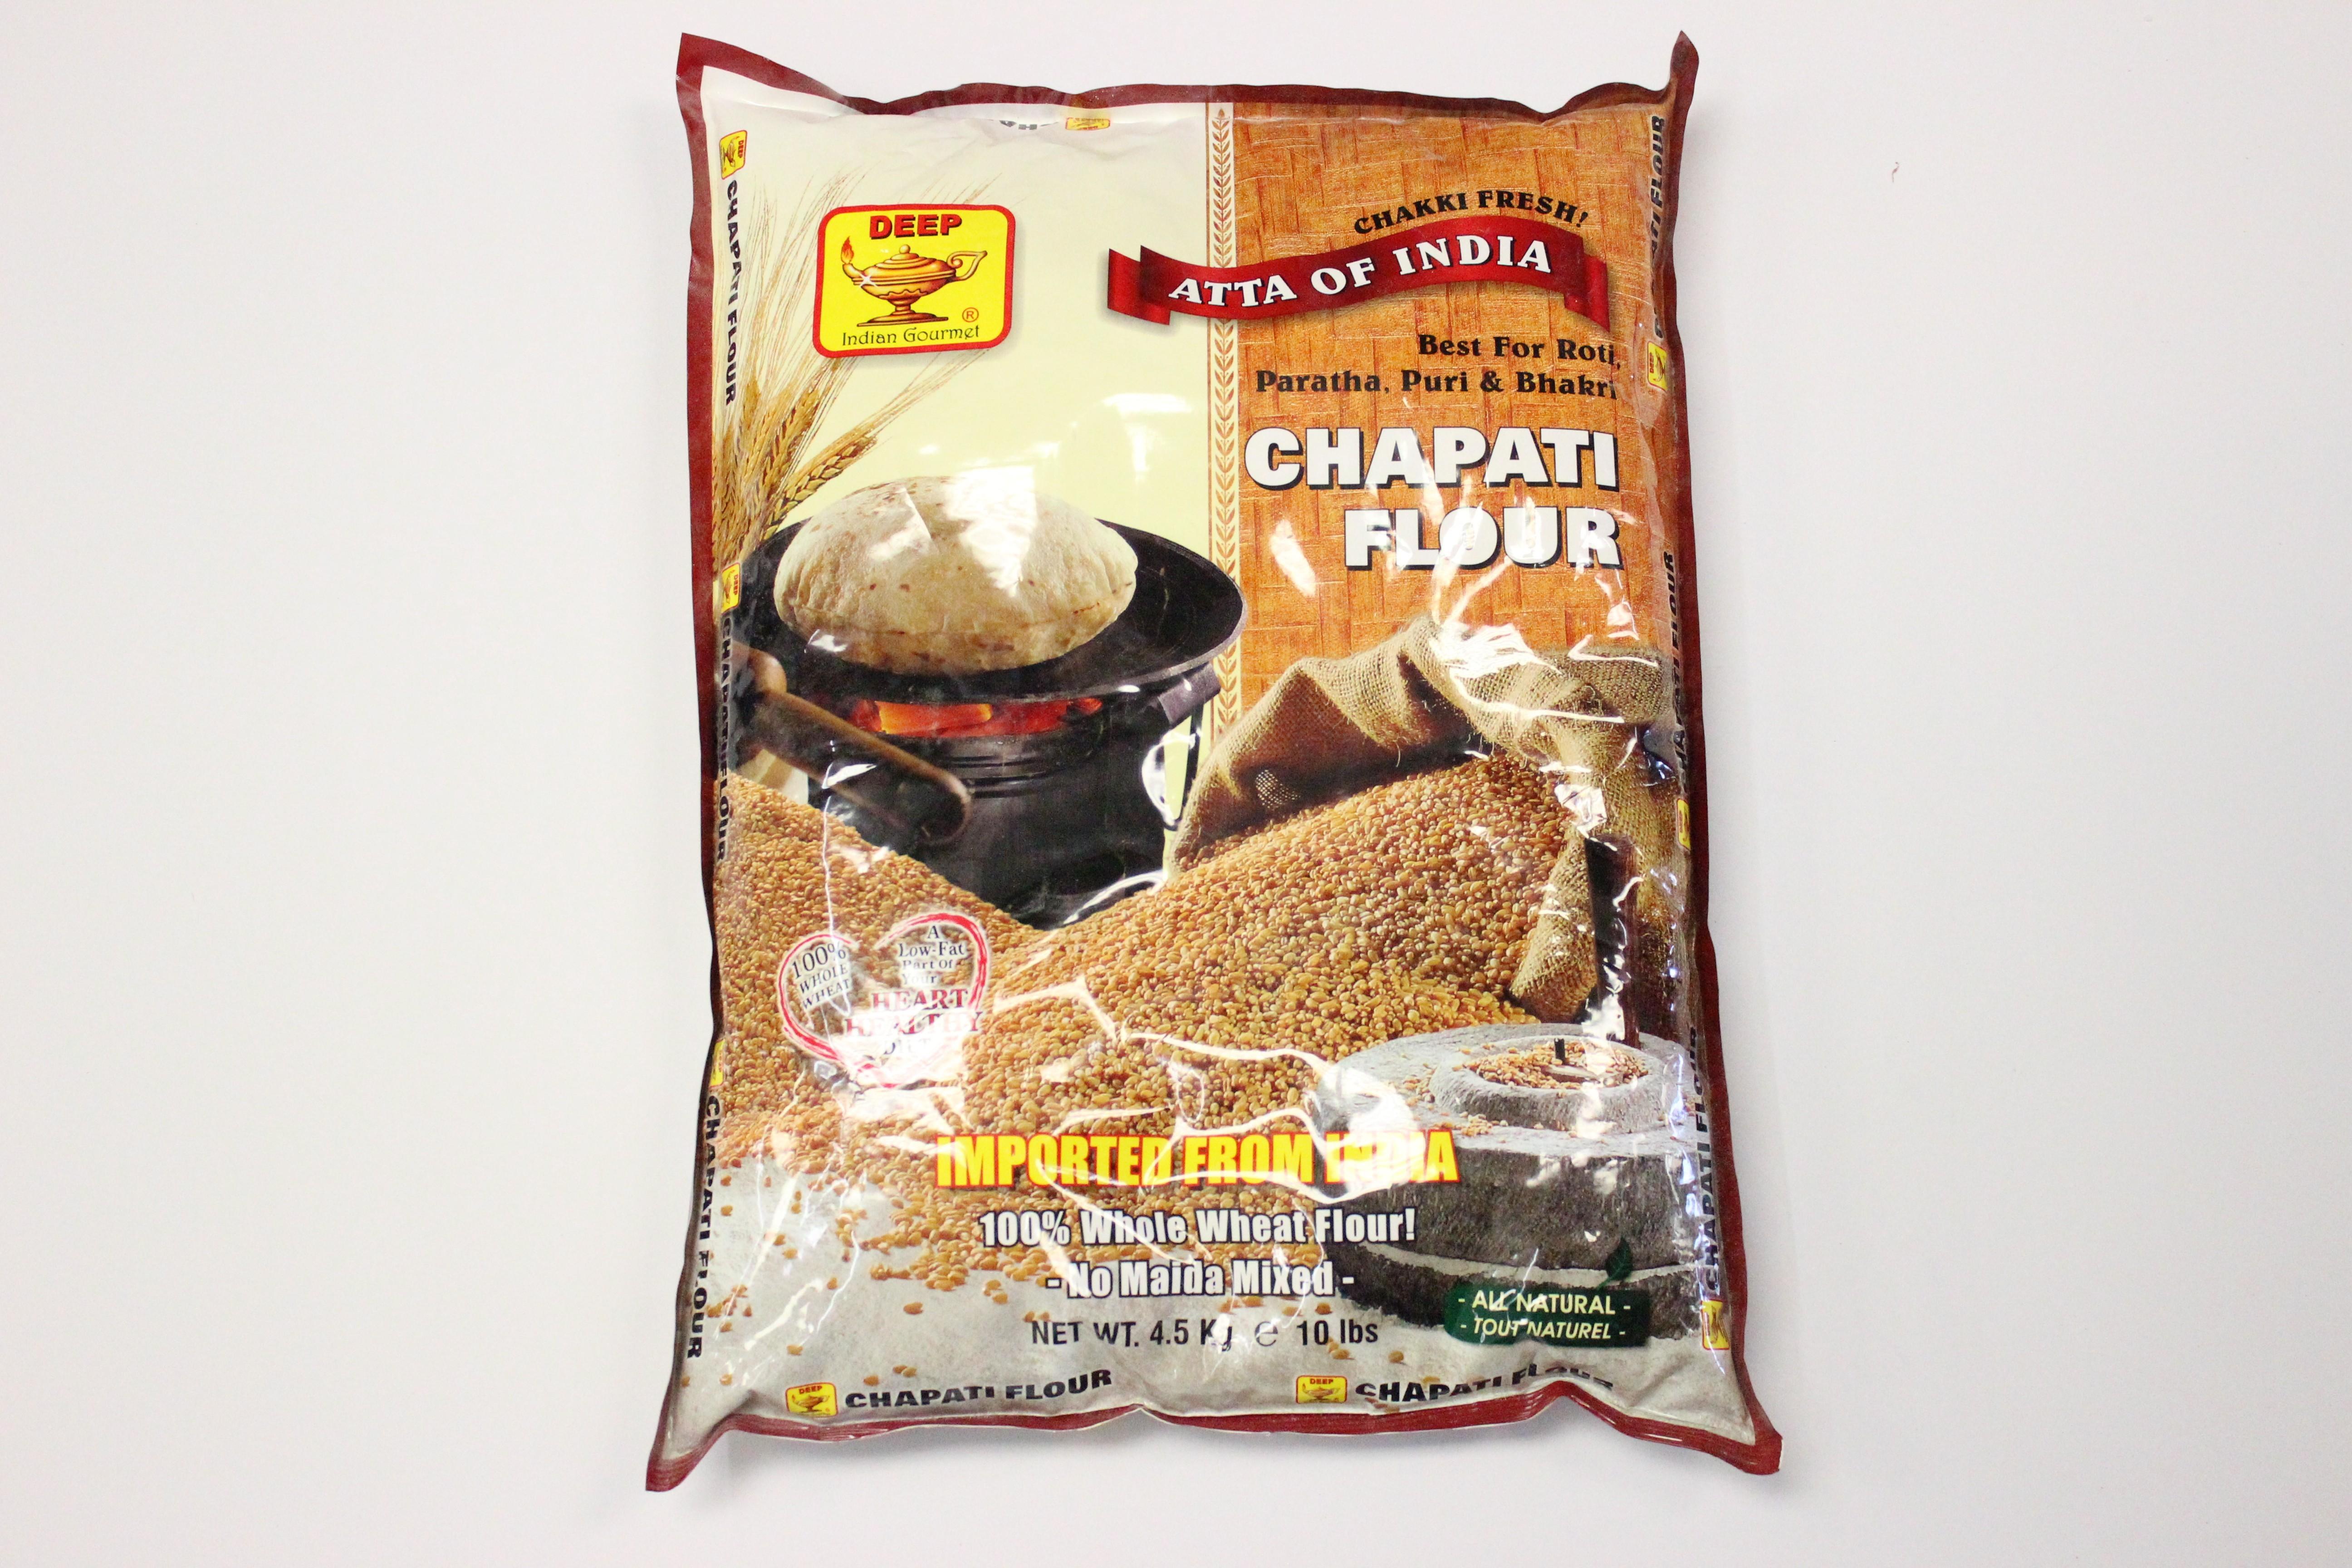 Deep Whole Wheat Chapati Flour 10 lbs